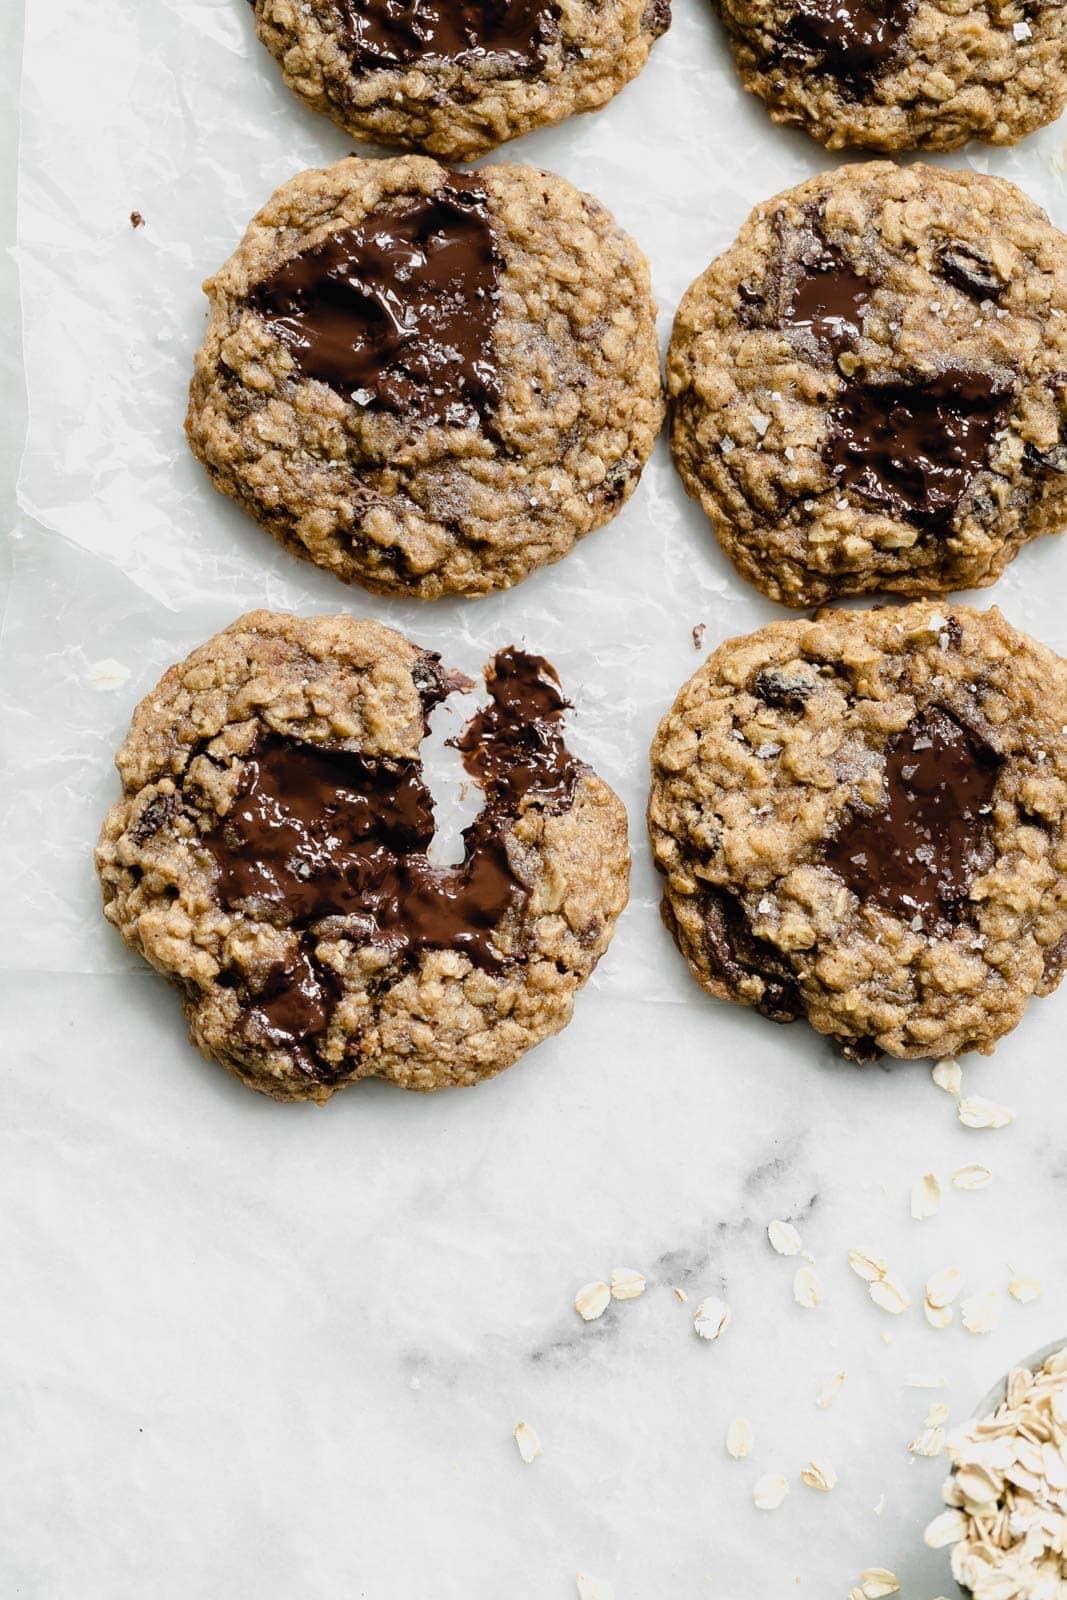 best oatmeal raisin cookies on countertop